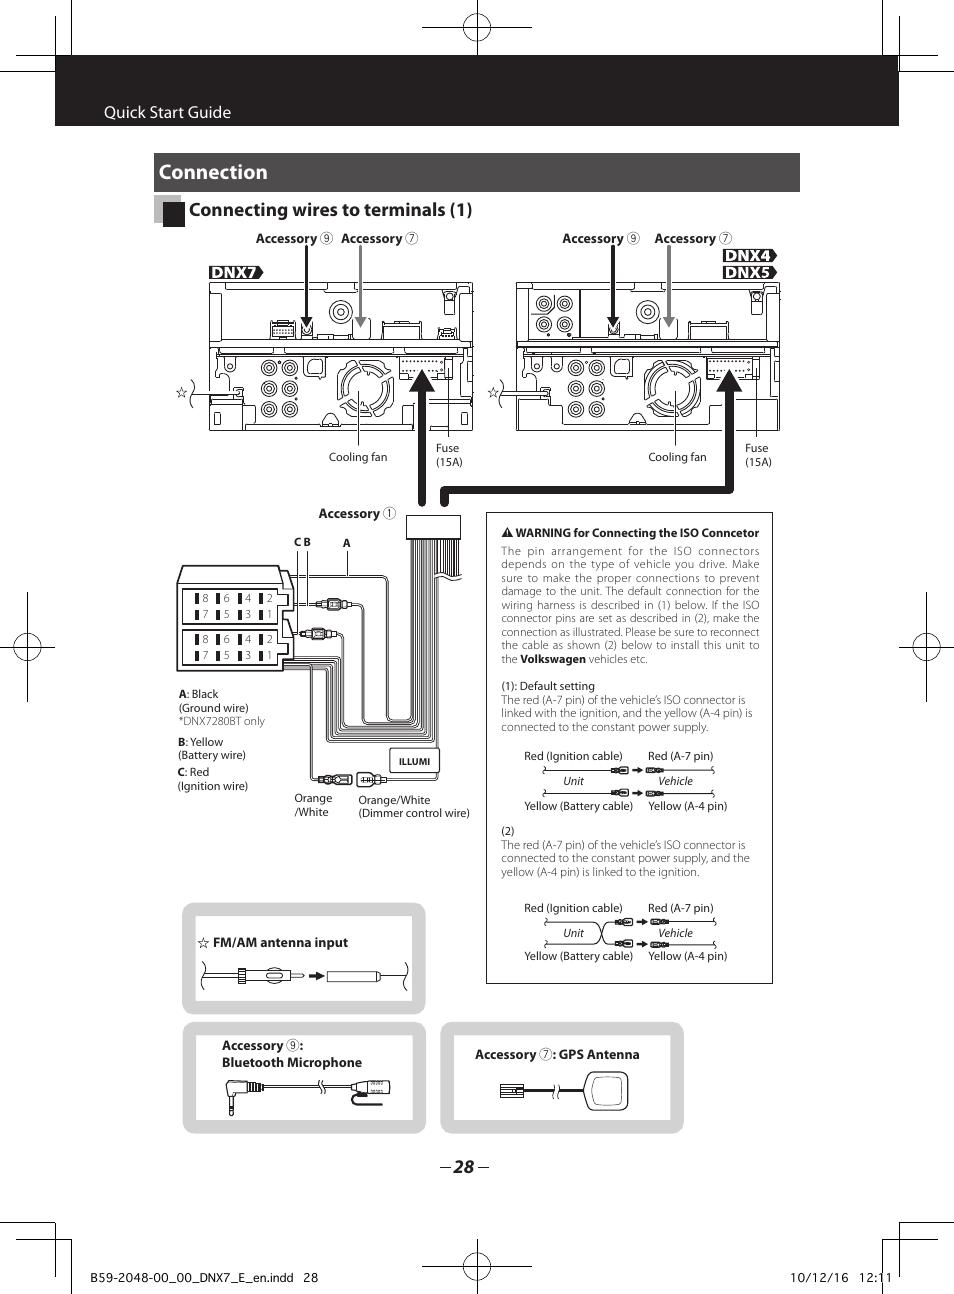 Diagram In Pictures Database Kenwood Car Stereo Wiring Harness Diagram Kdc Bt558u Just Download Or Read Kdc Bt558u Online Casalamm Edu Mx